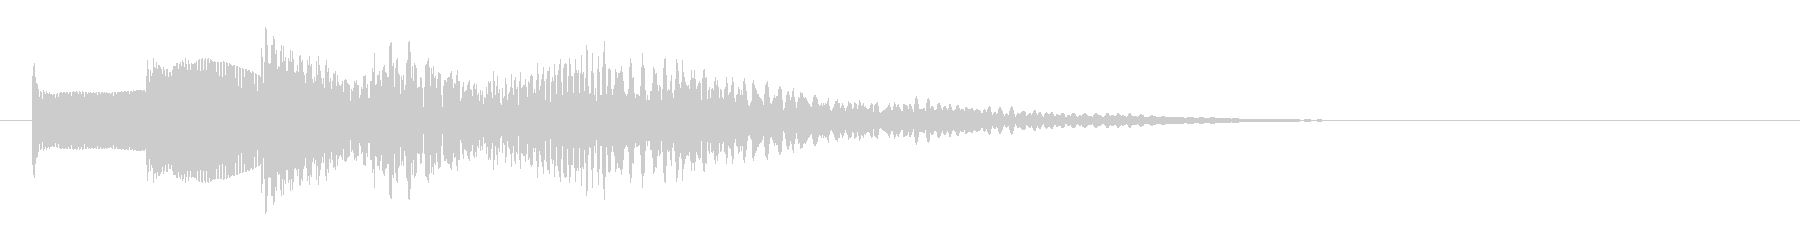 KANTベルサウンドジングル72の未再生の波形